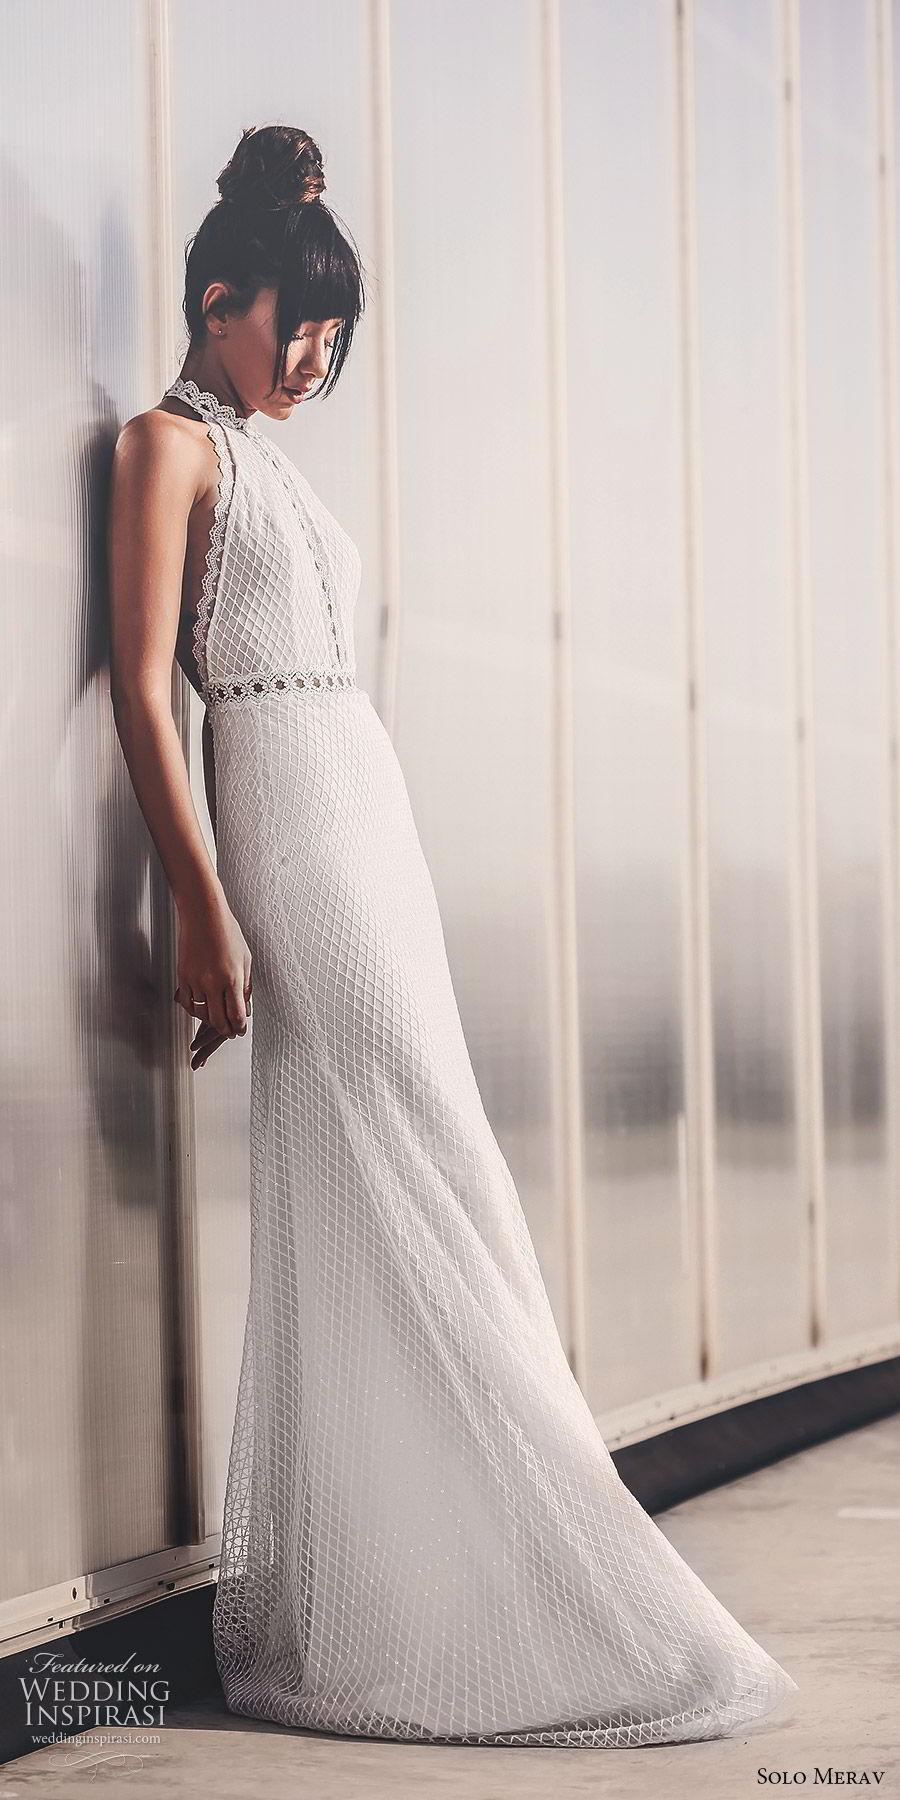 solo merav 2019 bridal sleeveless halter neck fully embellished sheath trumpet wedding dress (8) sv sweep train elegant modern romantic